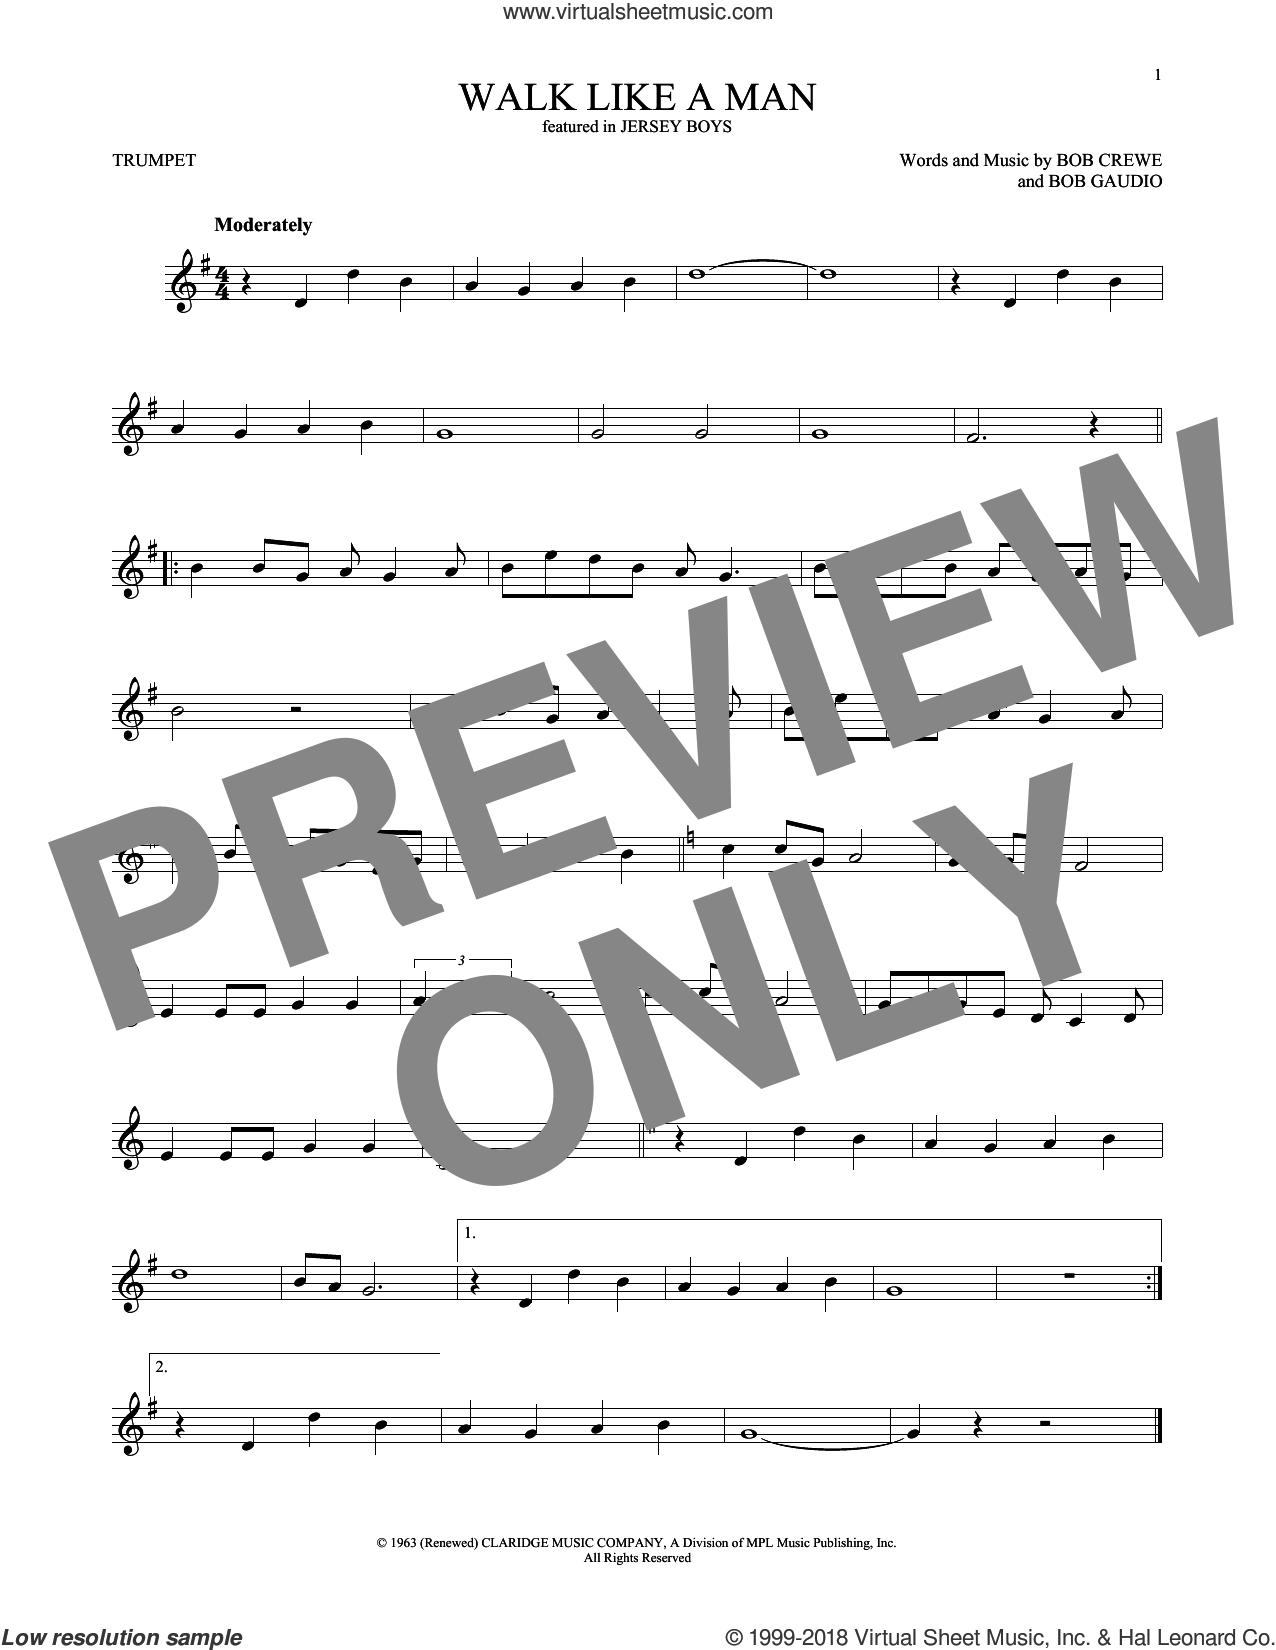 Walk Like A Man sheet music for trumpet solo by The Four Seasons, Bob Crewe and Bob Gaudio, intermediate skill level